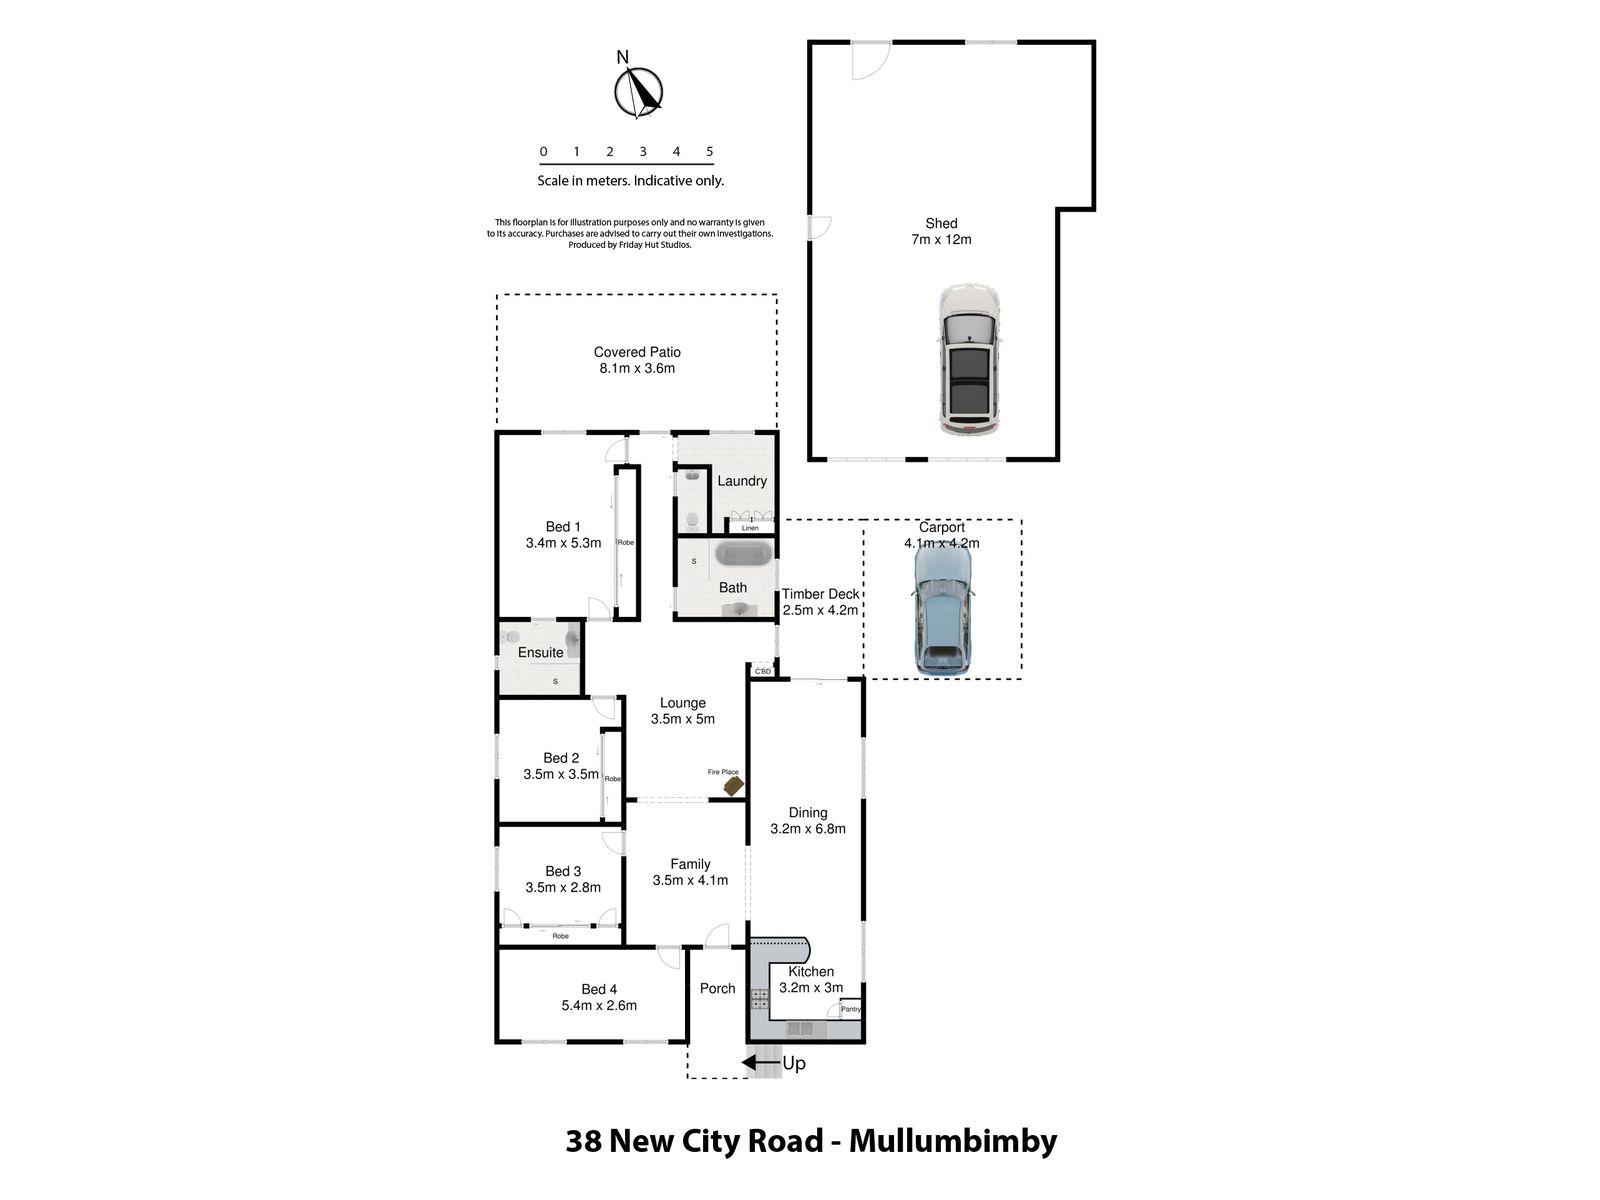 38 New City Road, Mullumbimby